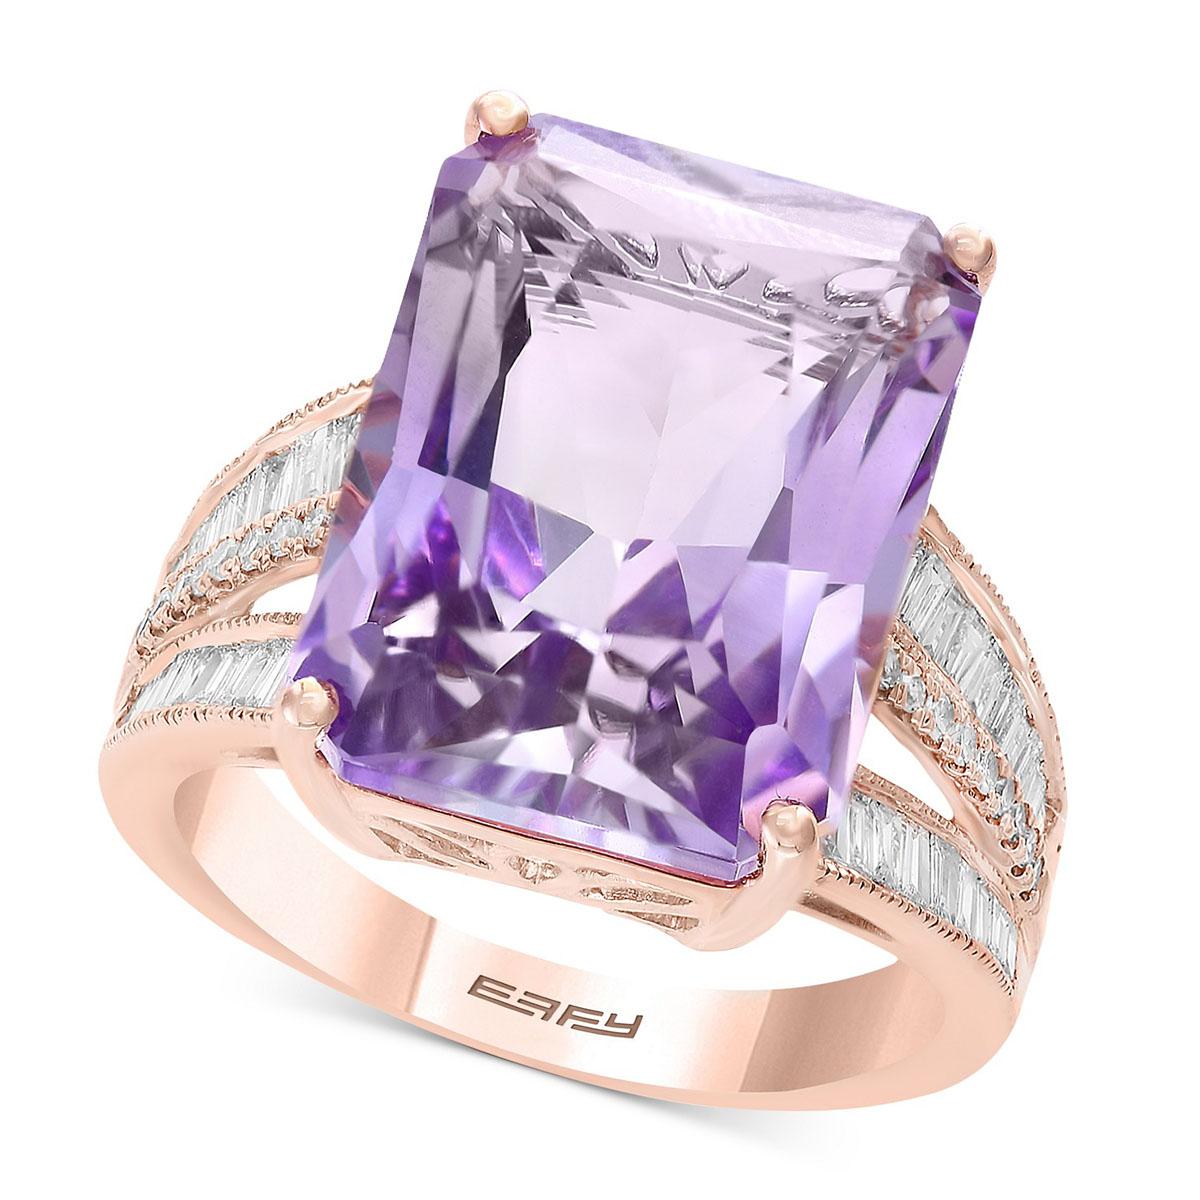 انگشتر طلا زنانه مدل حوران با سنگ آمیتیس و الماس